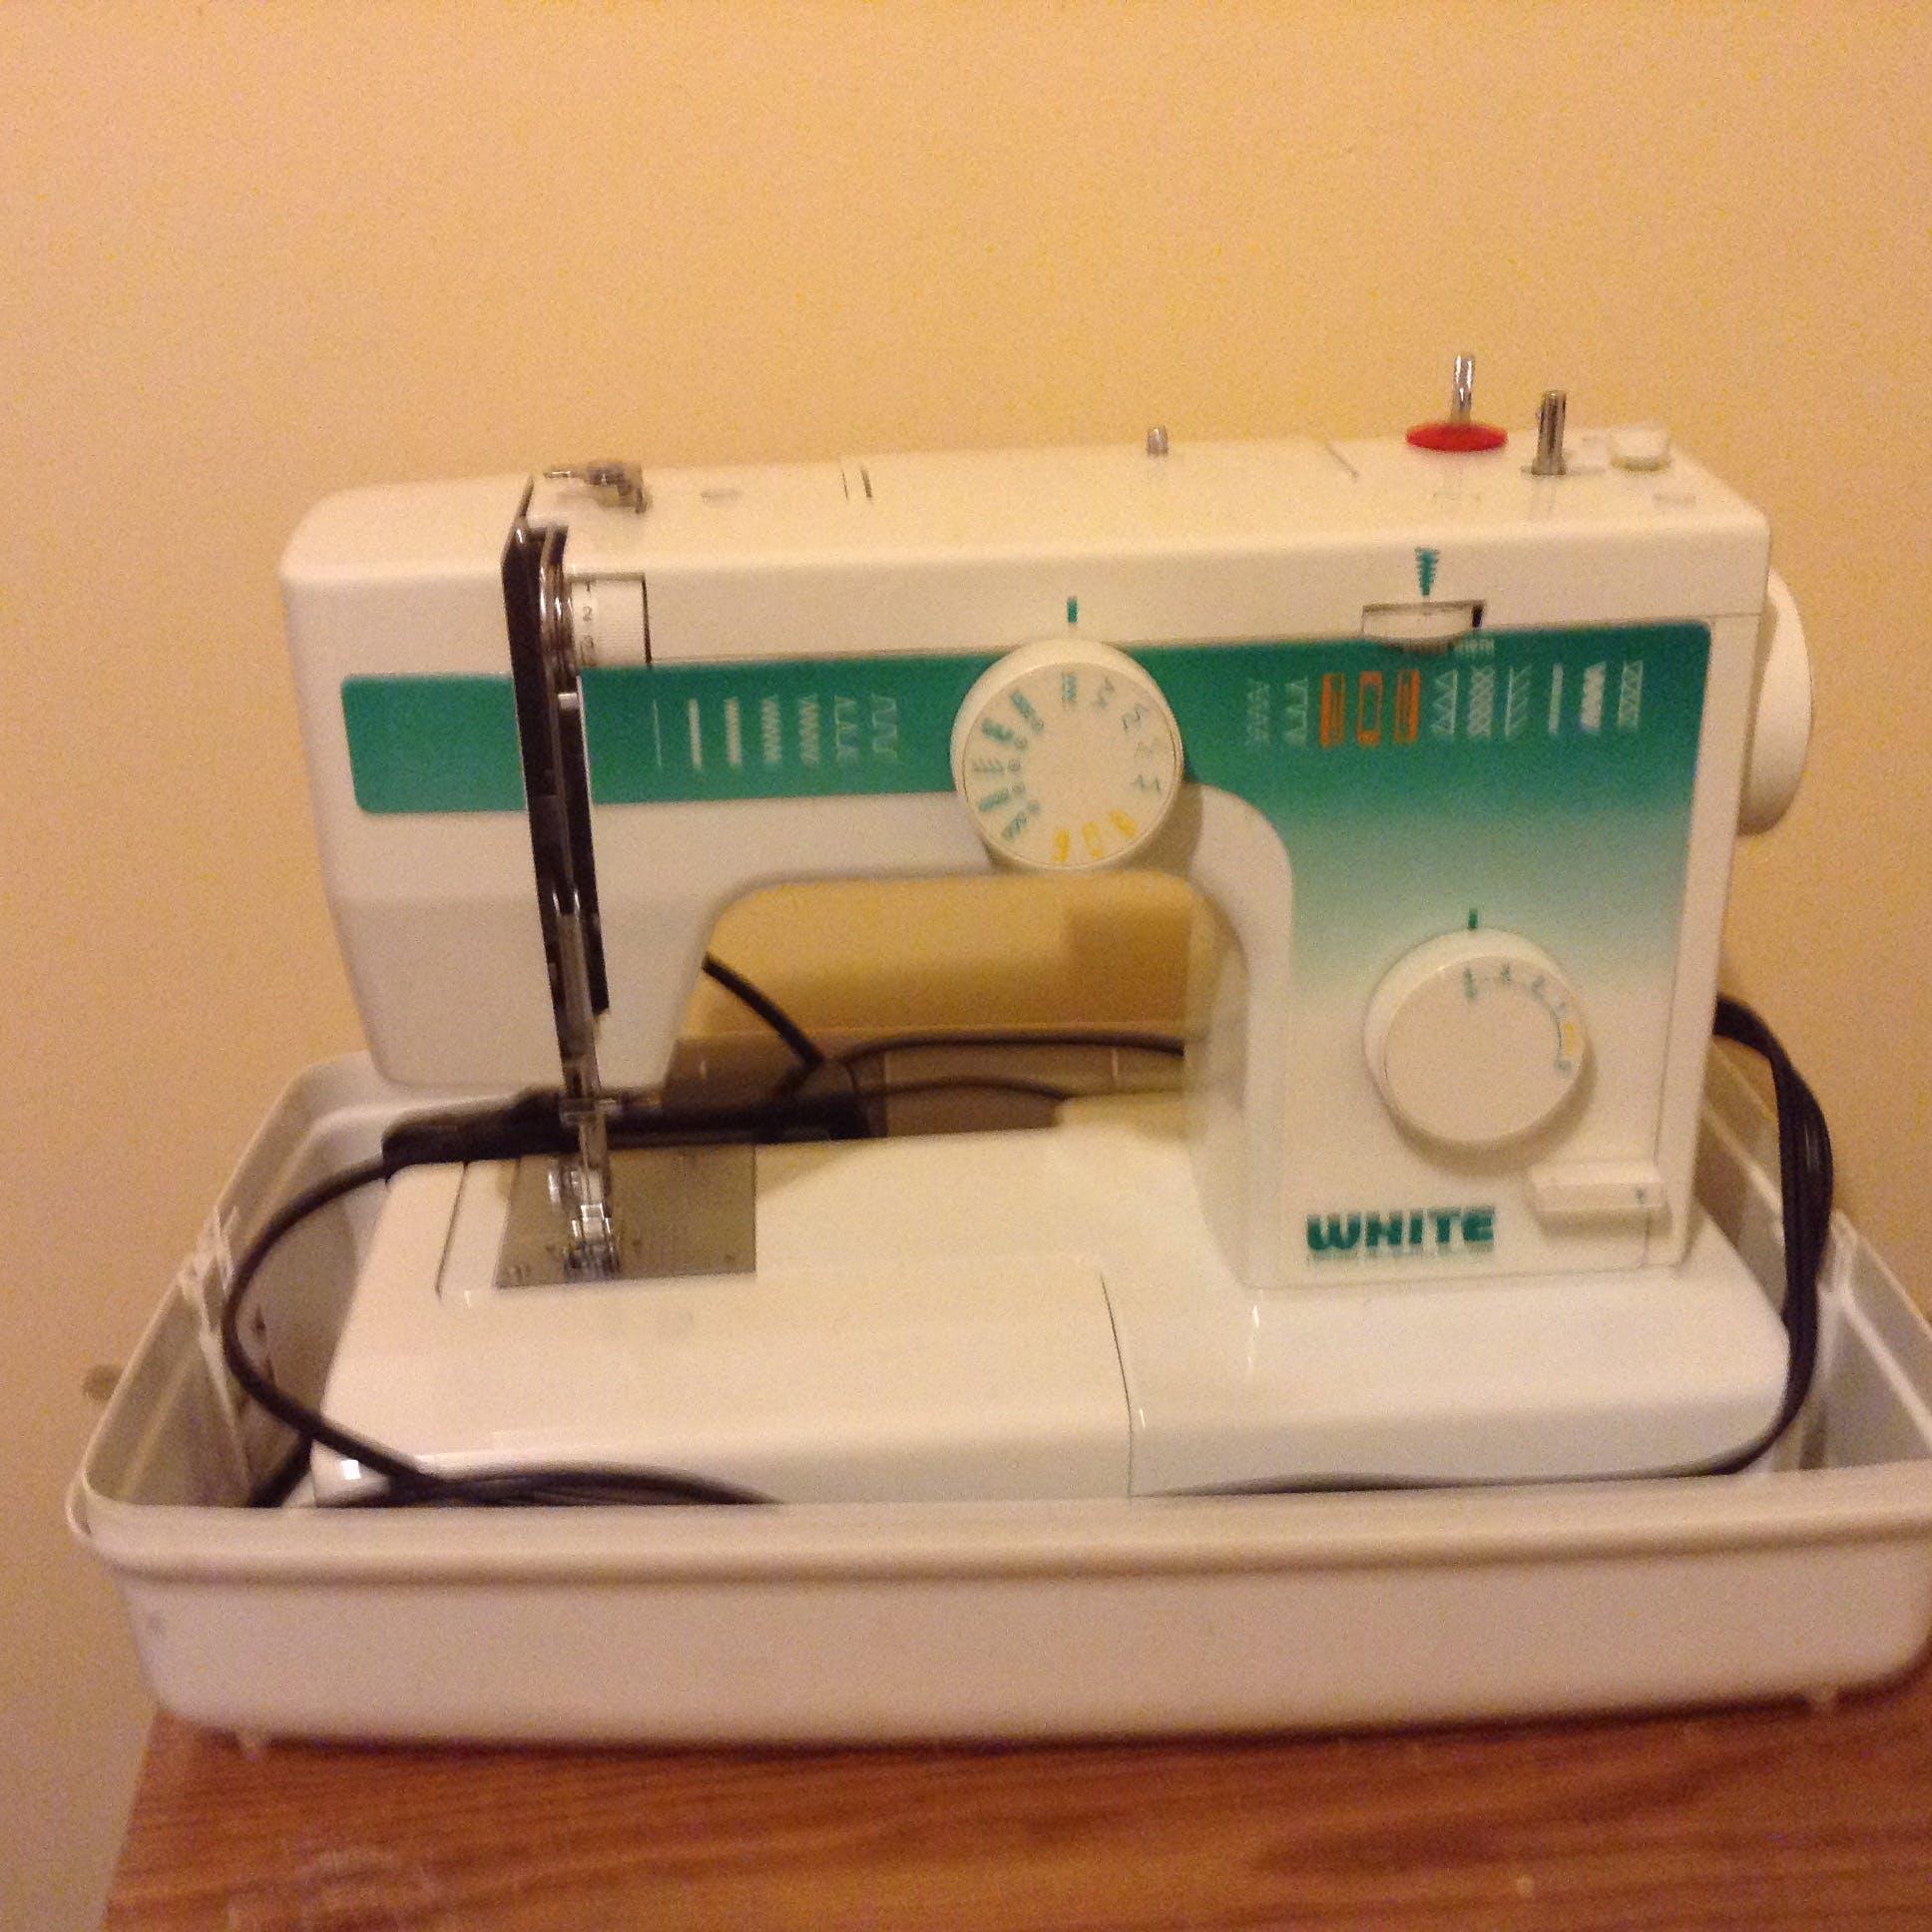 Free stock photo of sewing machine